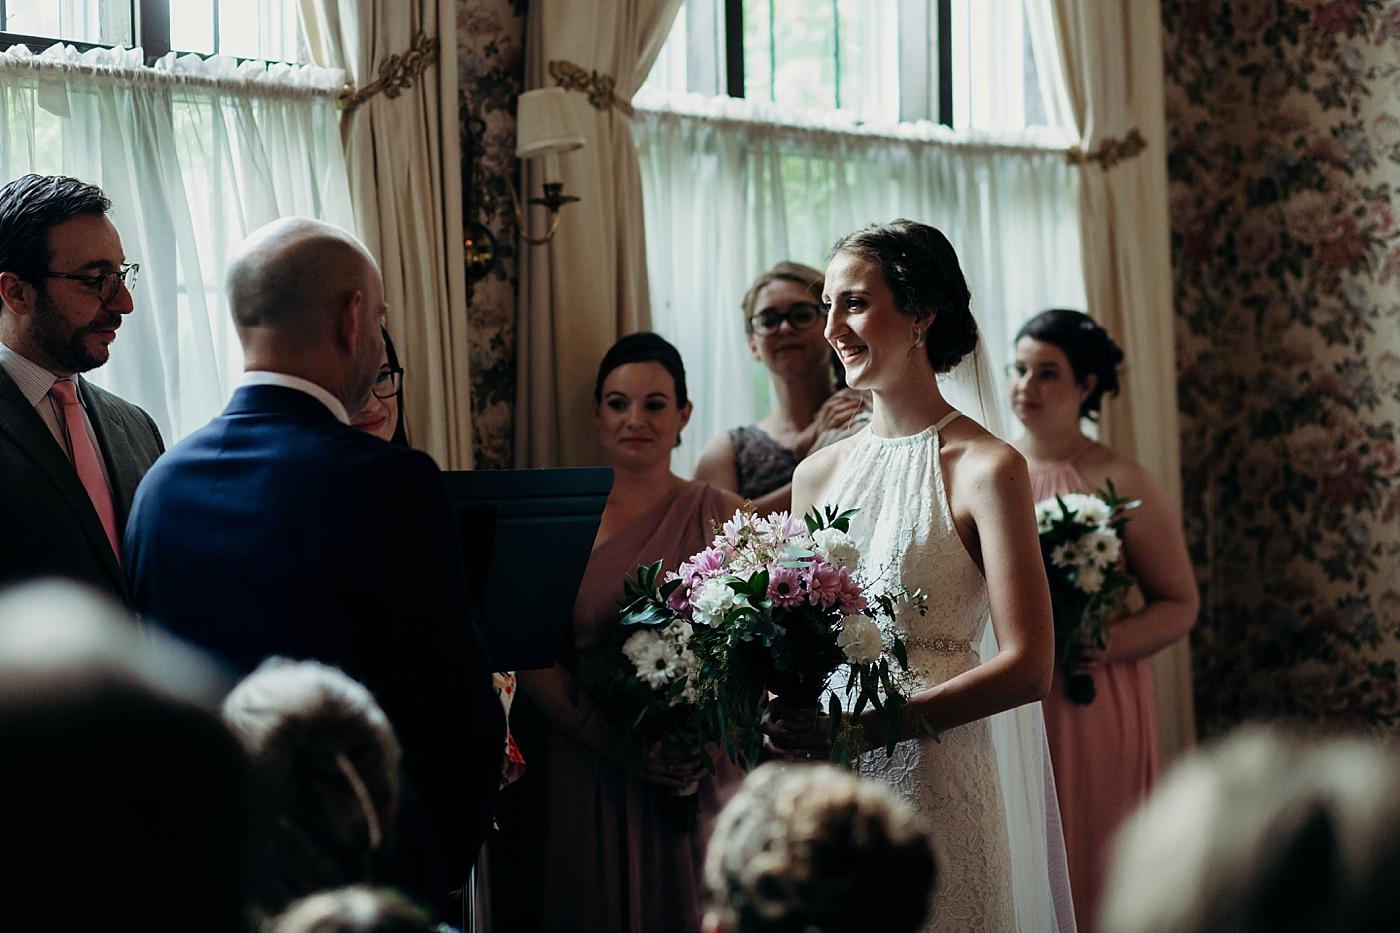 Chateau-Michelle-Wedding-Julia+JuanLuis_TheHeartlandersCo2018LA-263.jpg